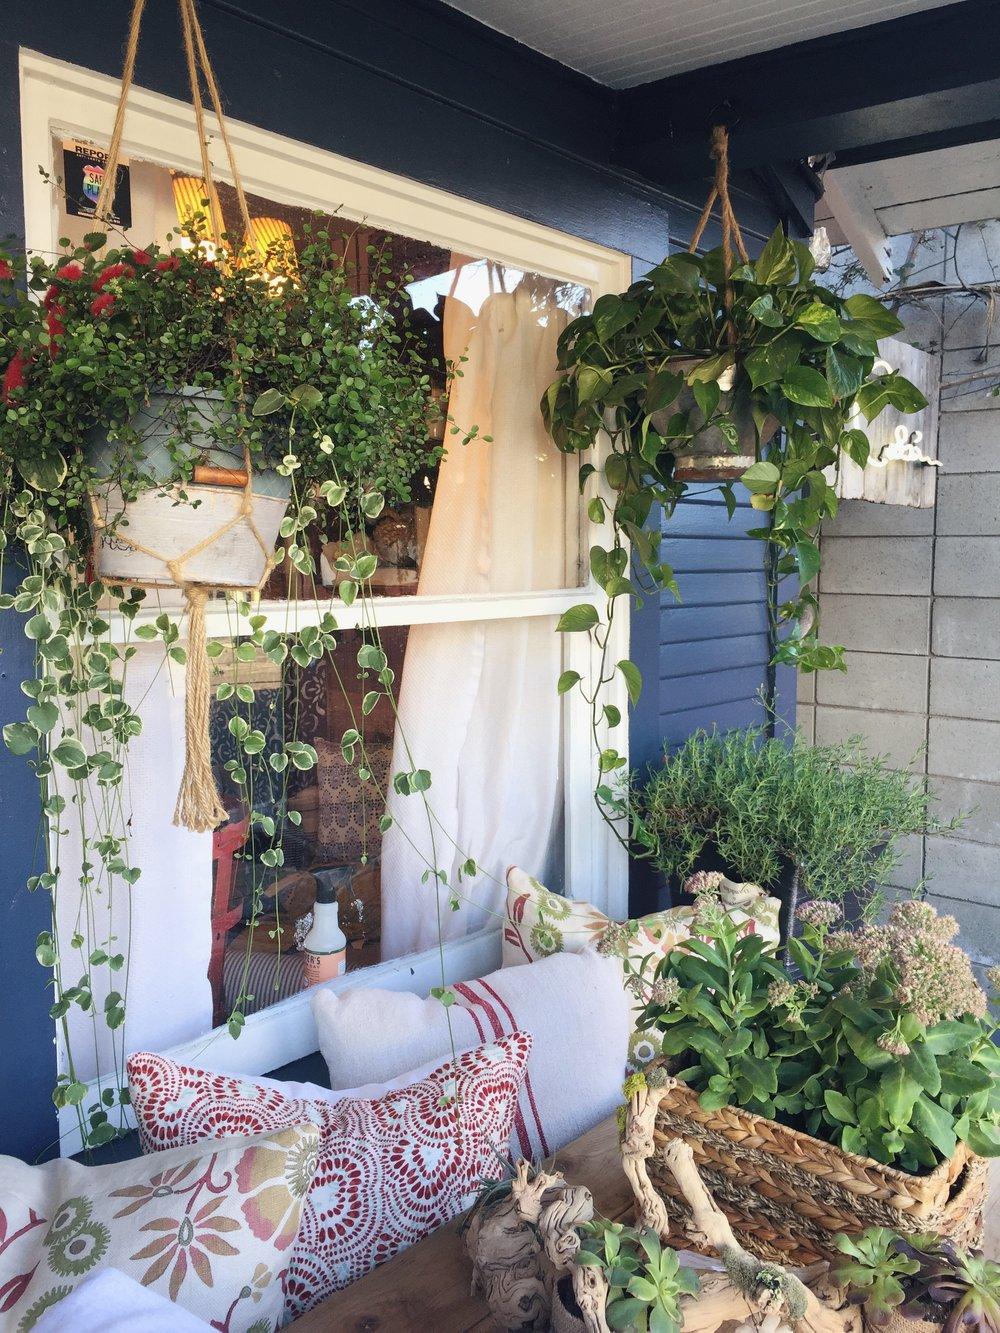 Tumbleweed & Dandelion, Venice, CA